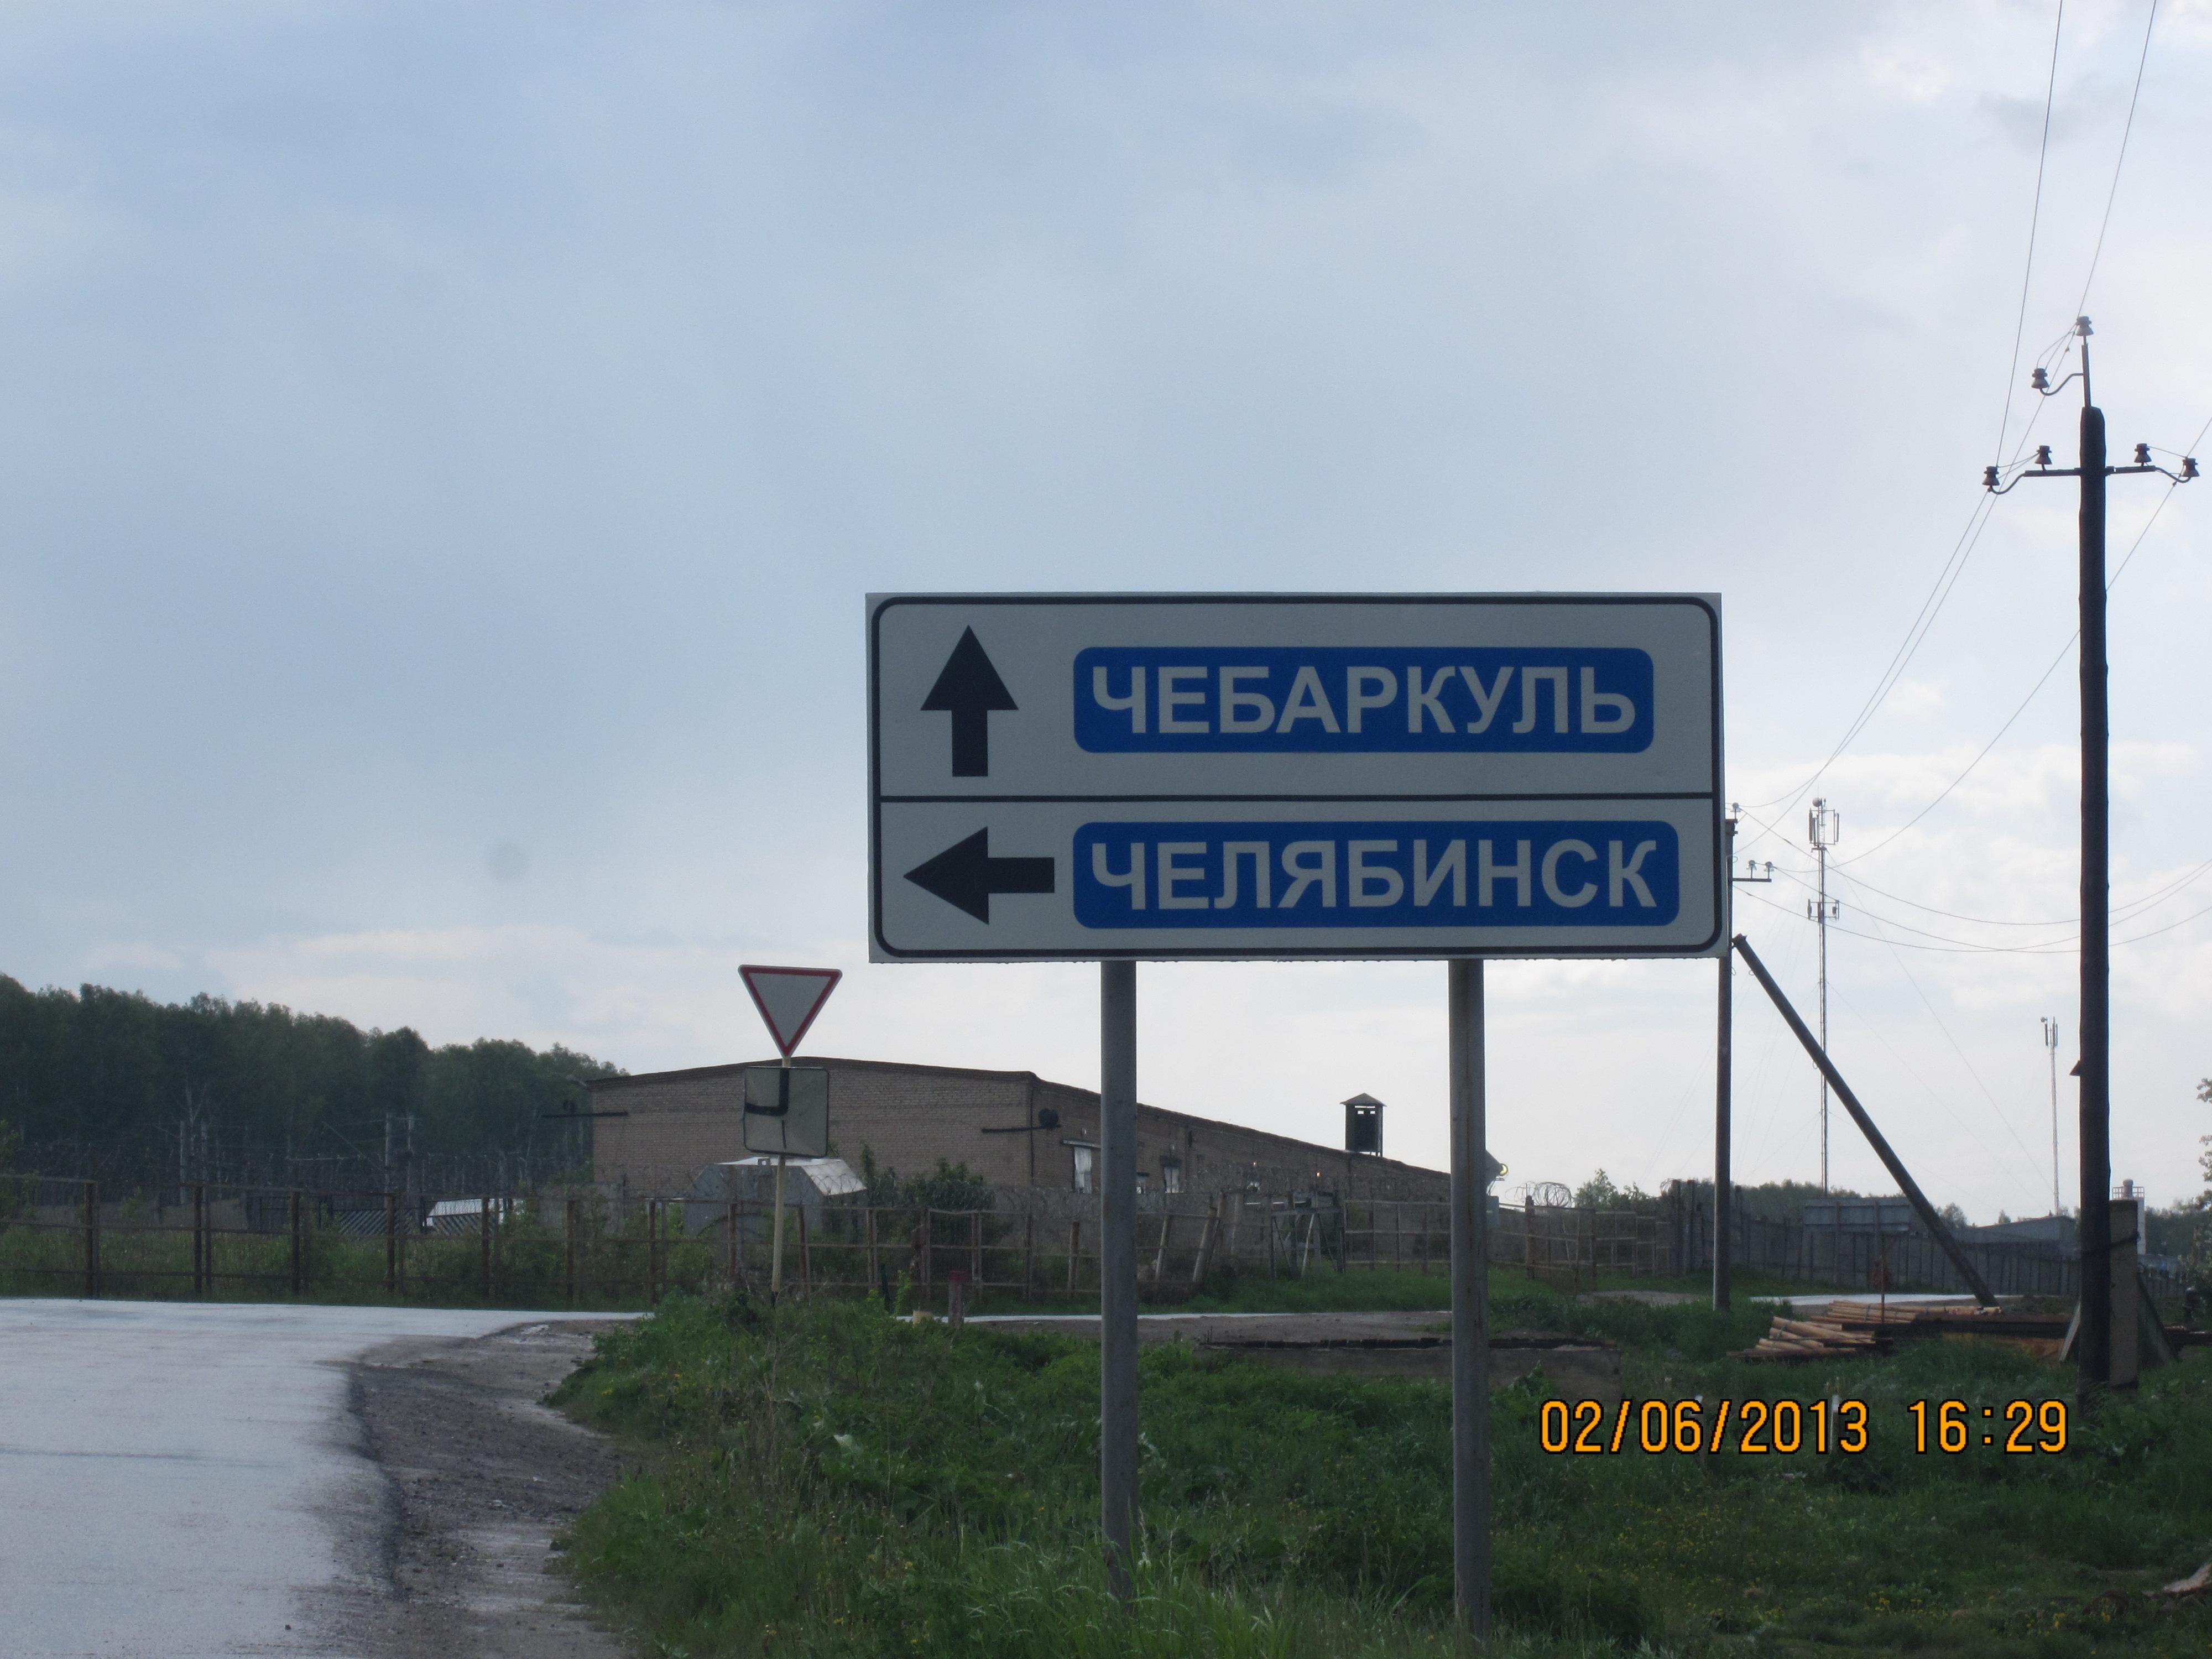 http://s3.uploads.ru/UcwZY.jpg